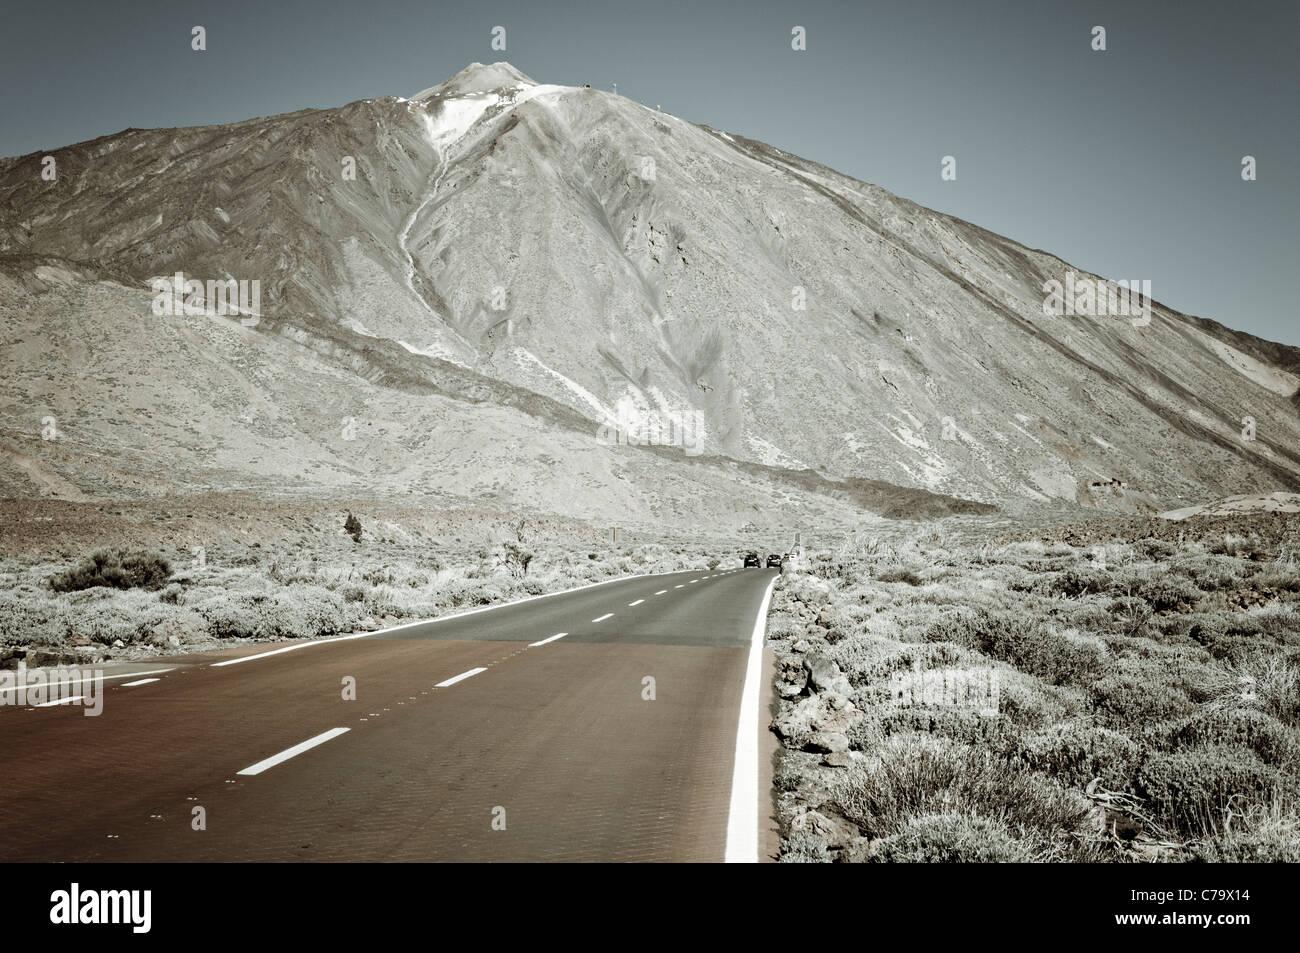 Highway on Mount Teide, Teide National Park, Unesco World Heritage Site, Tenerife, Canary Islands, Spain, Europe - Stock Image